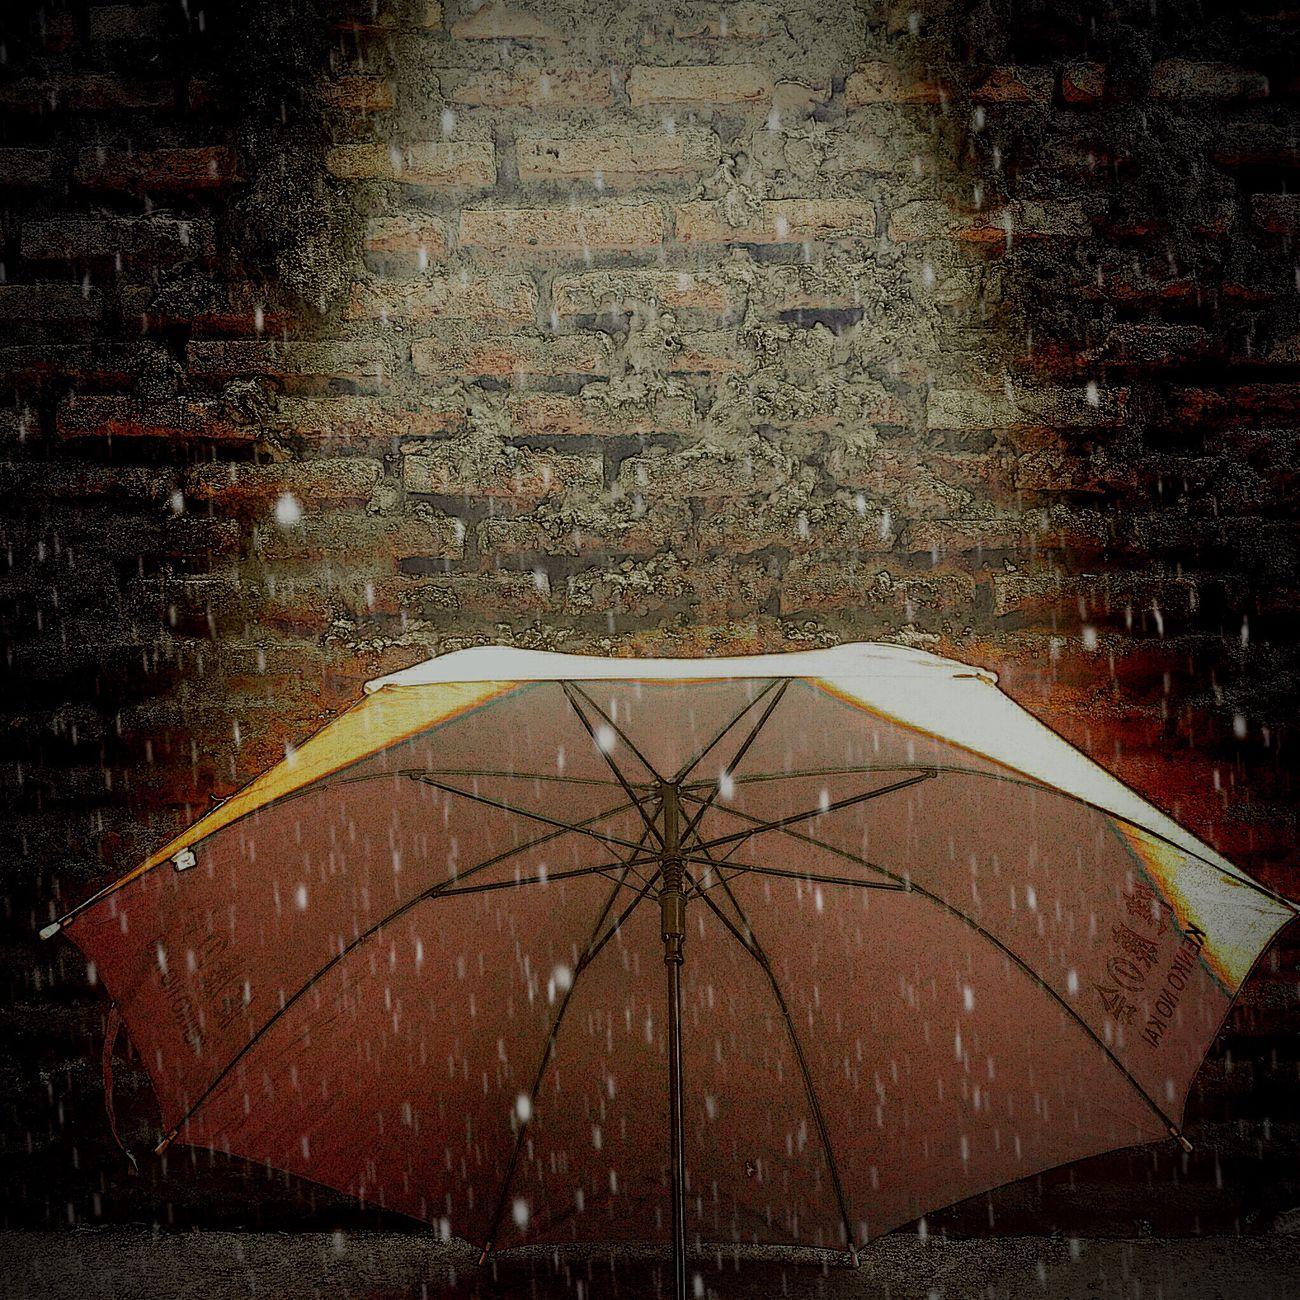 My Artwork My Creation My Creativity My Creations Illuminated Umbrella Rain Night No People Outdoors City Lights Rain Rainy Rainy Days EyeEm Gallery Photooftheday Photography In Motion